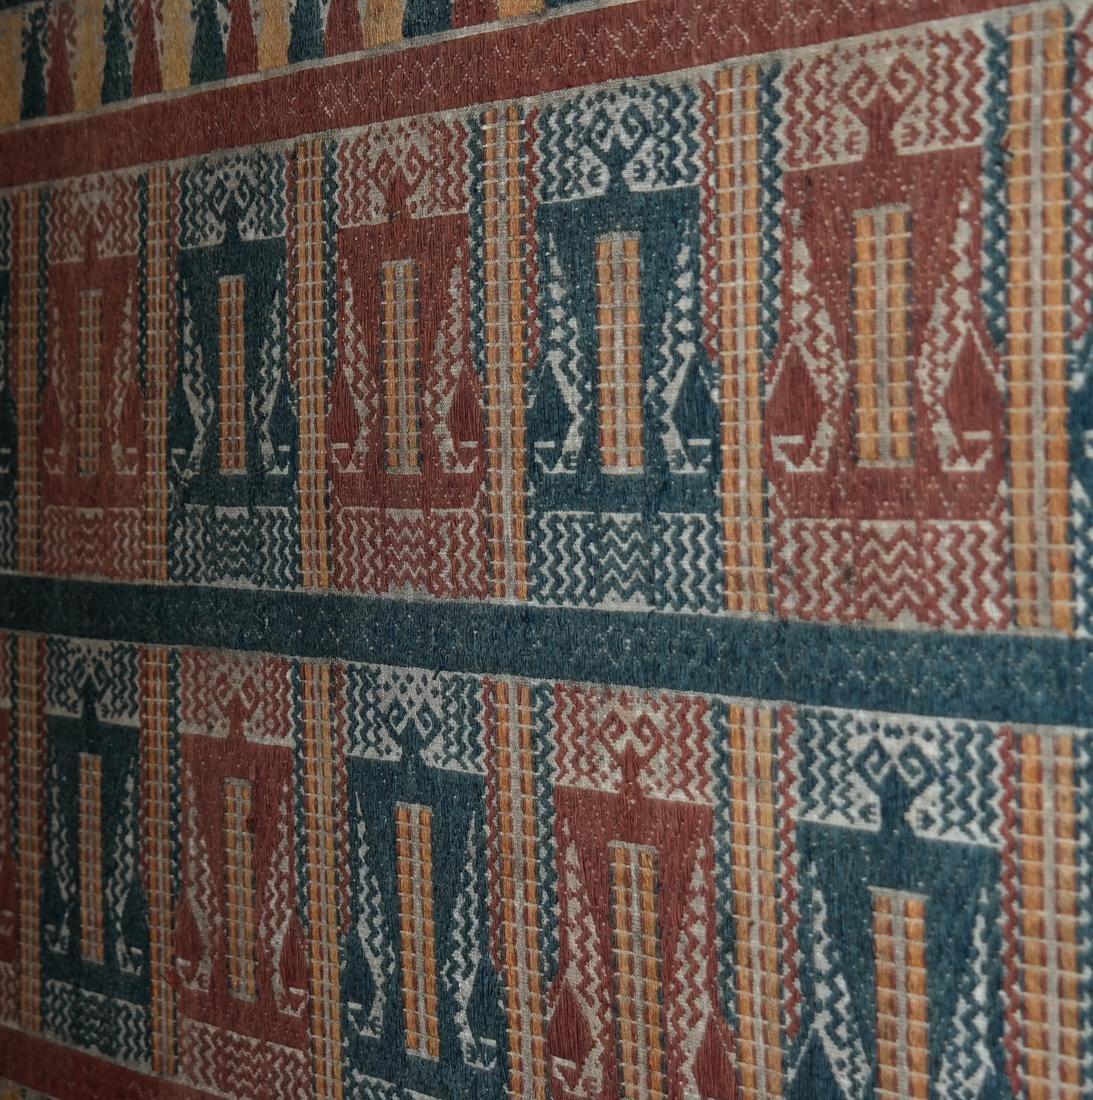 Ethnic Textiles- Indonesian Weaving - 5